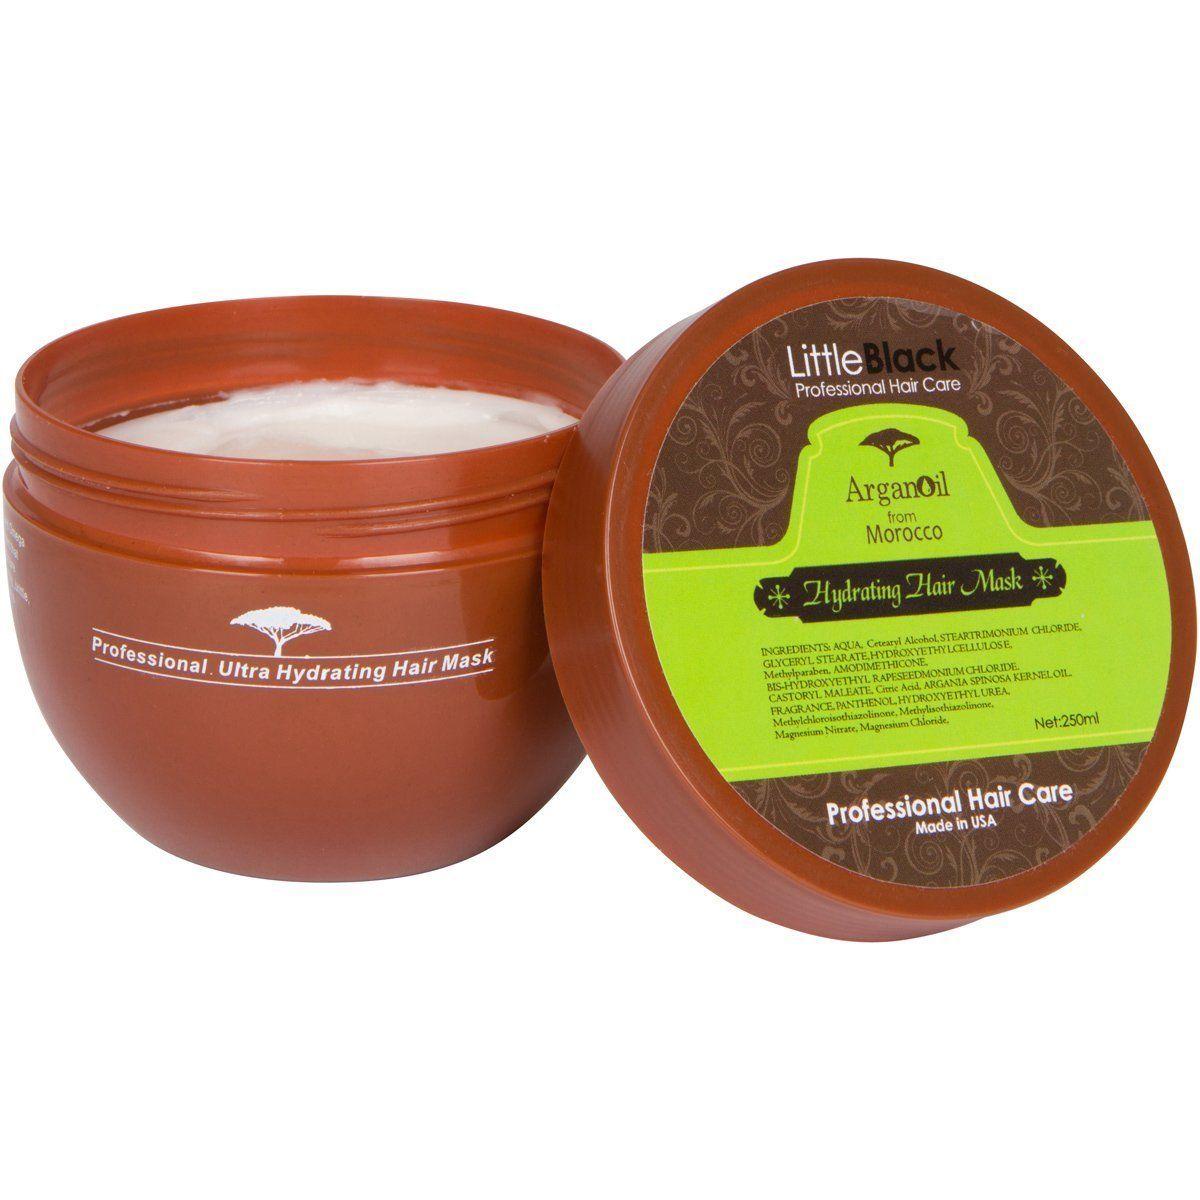 LittleBlack Professional Hair Care Argan Oil from Morocco